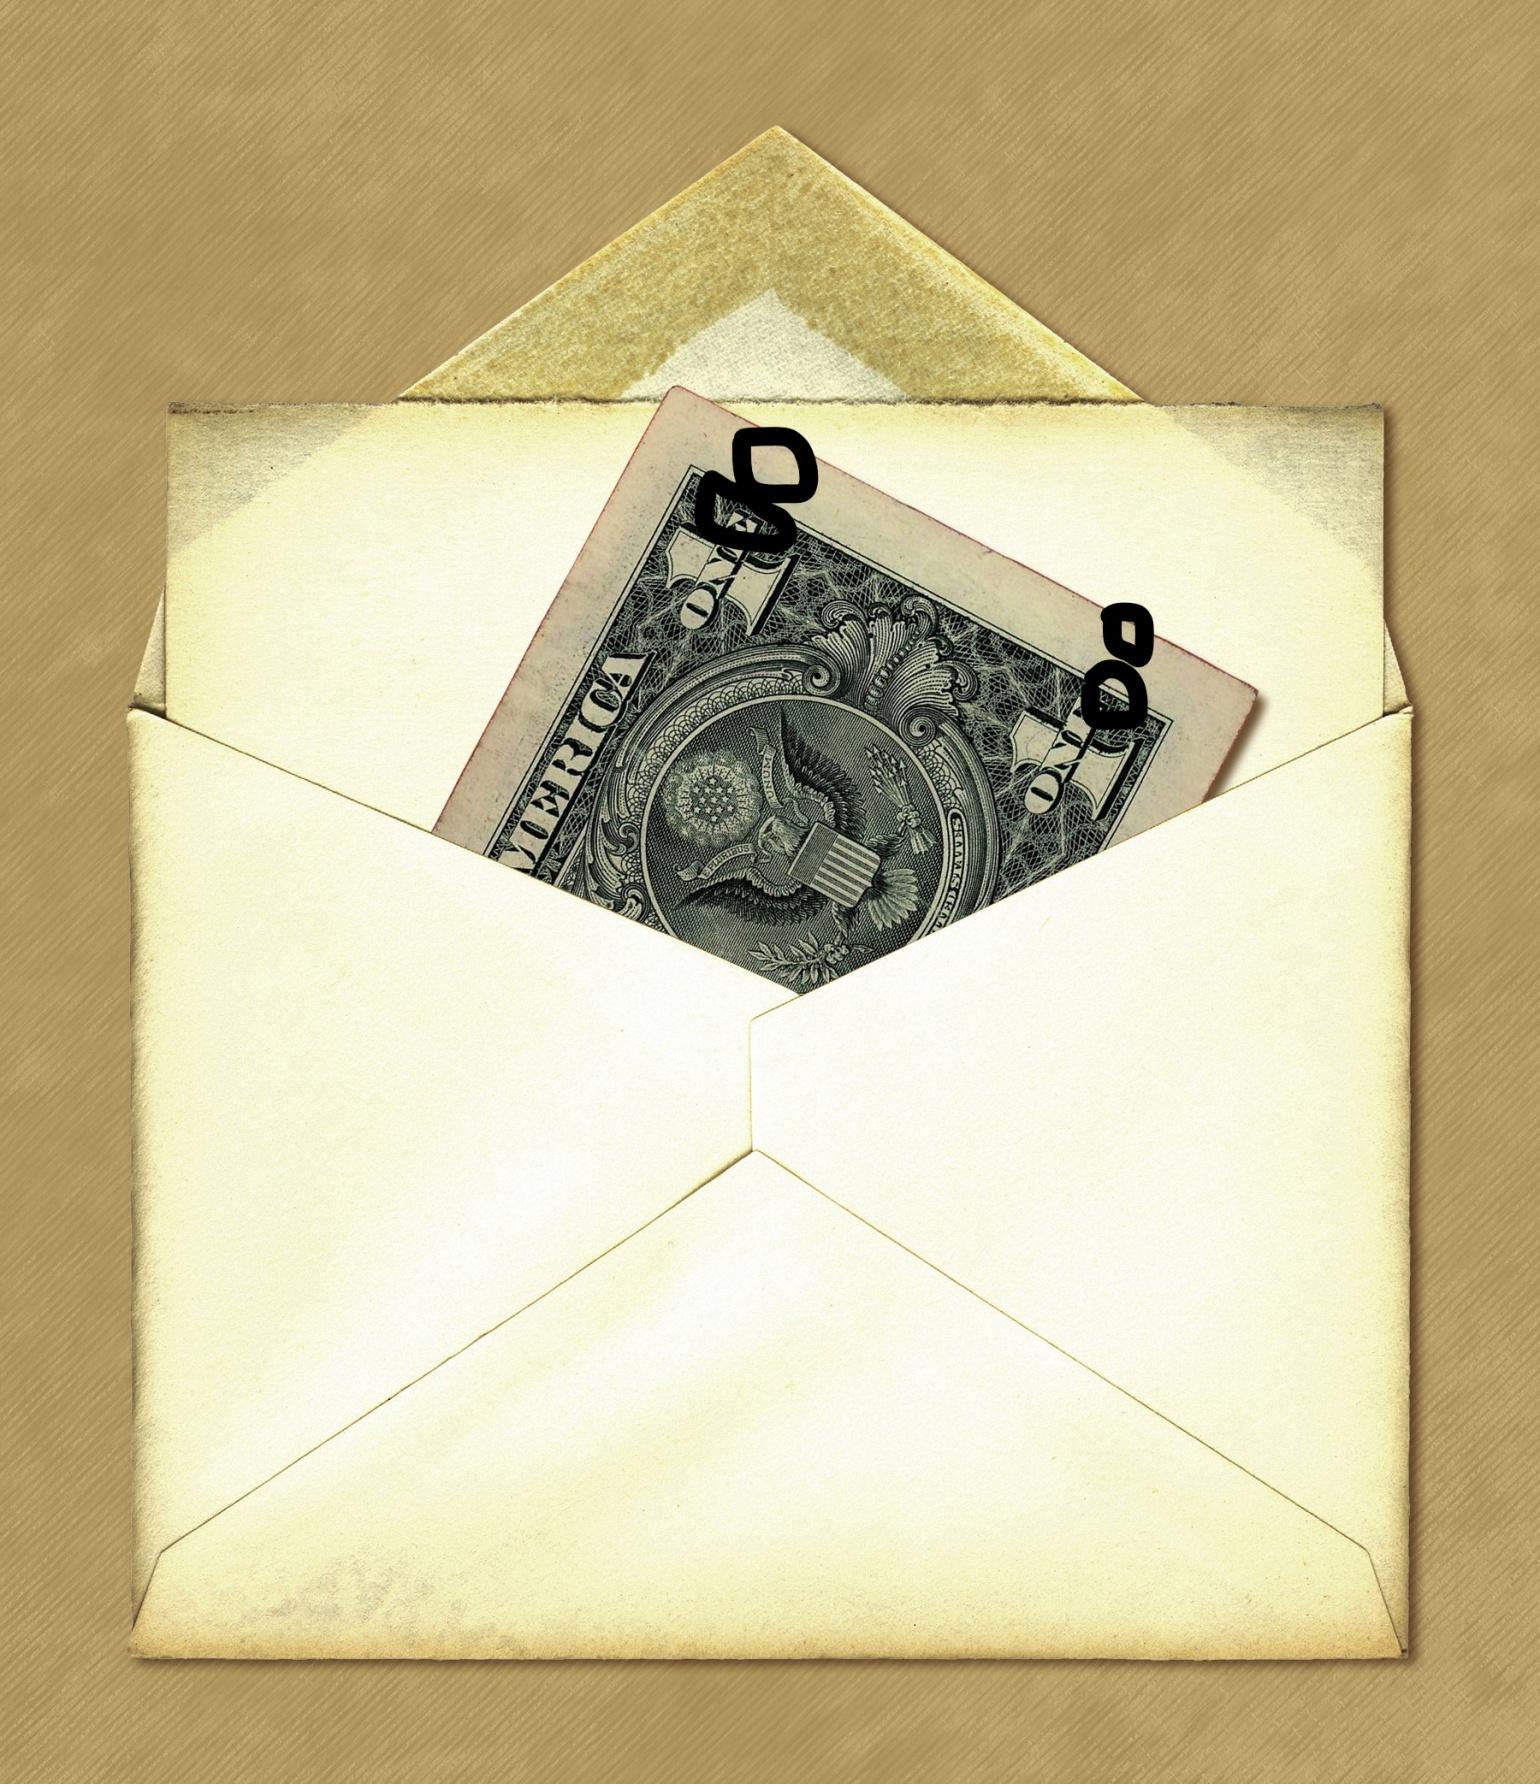 drawn money